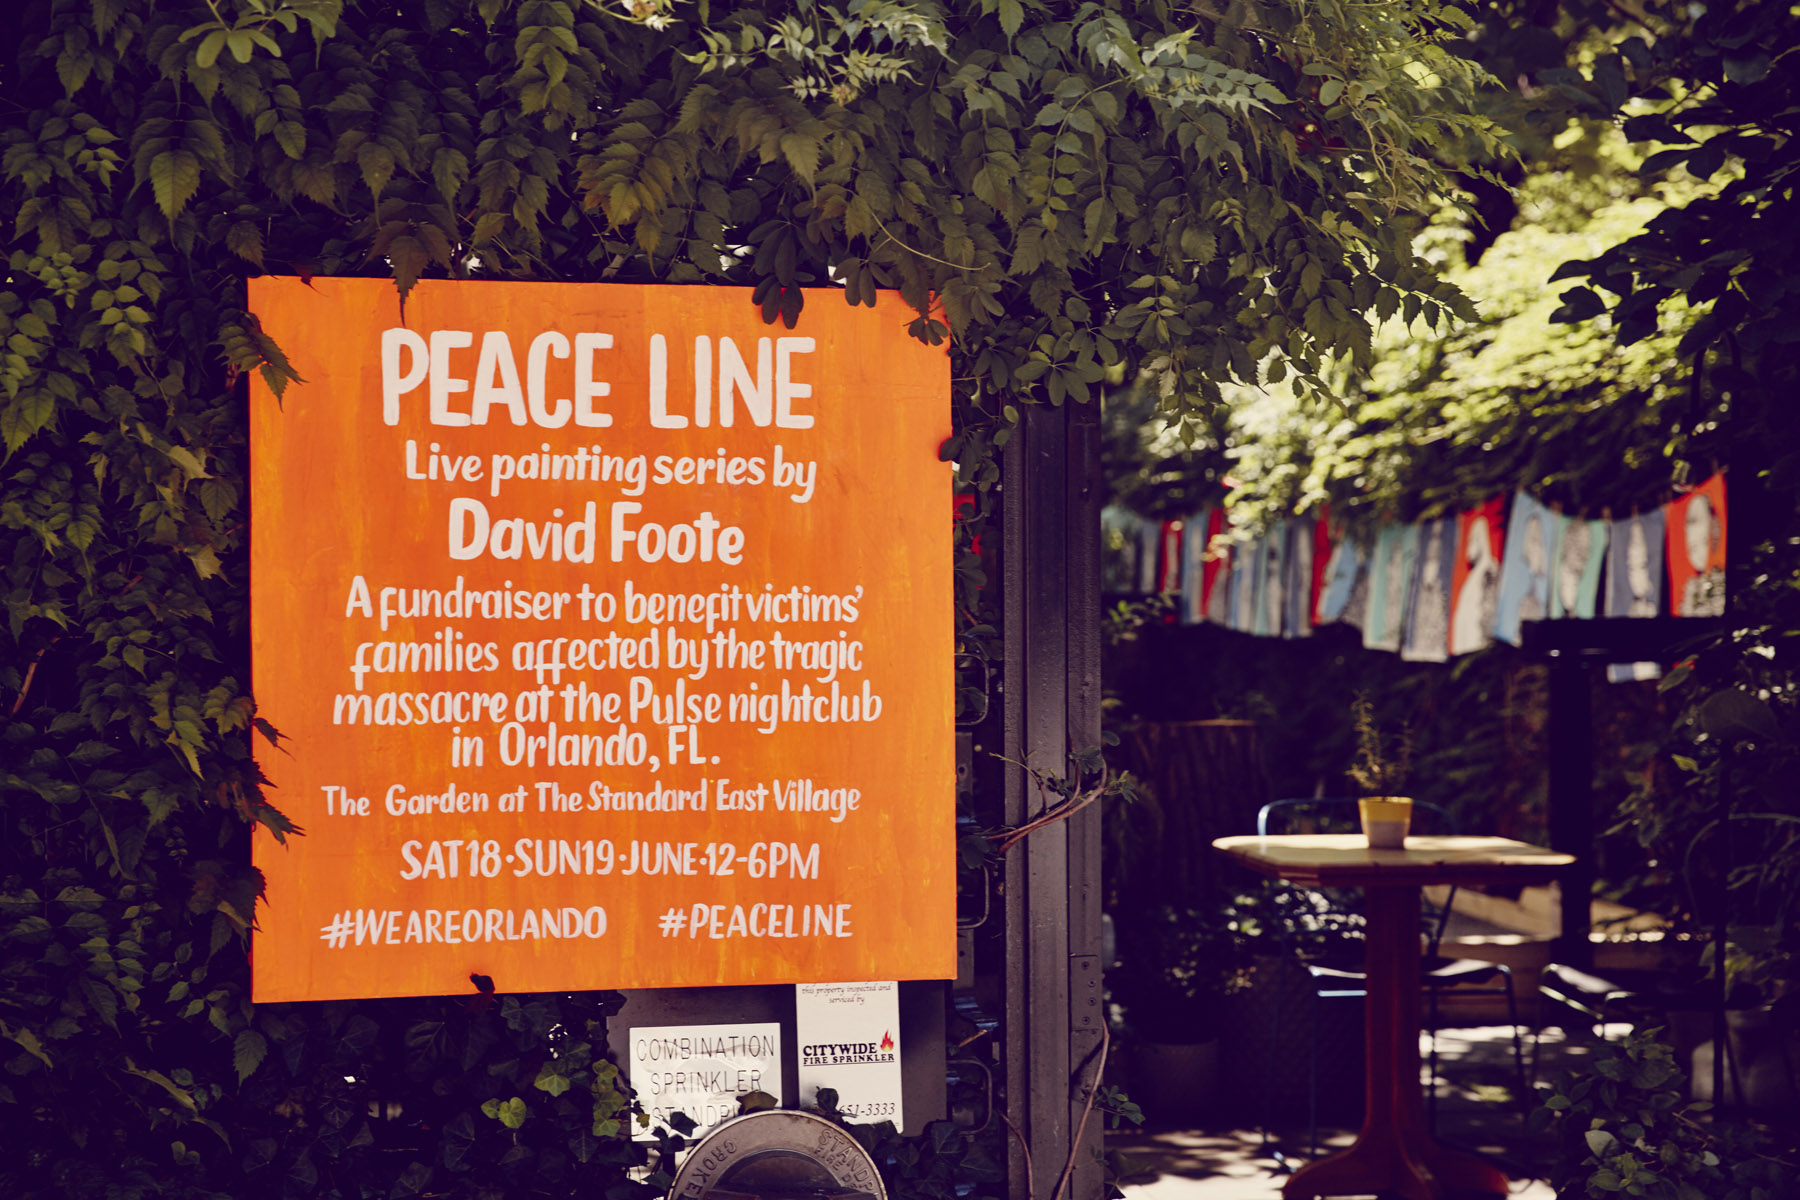 20160608-BB-20160618-PeaceLine-0027.jpg